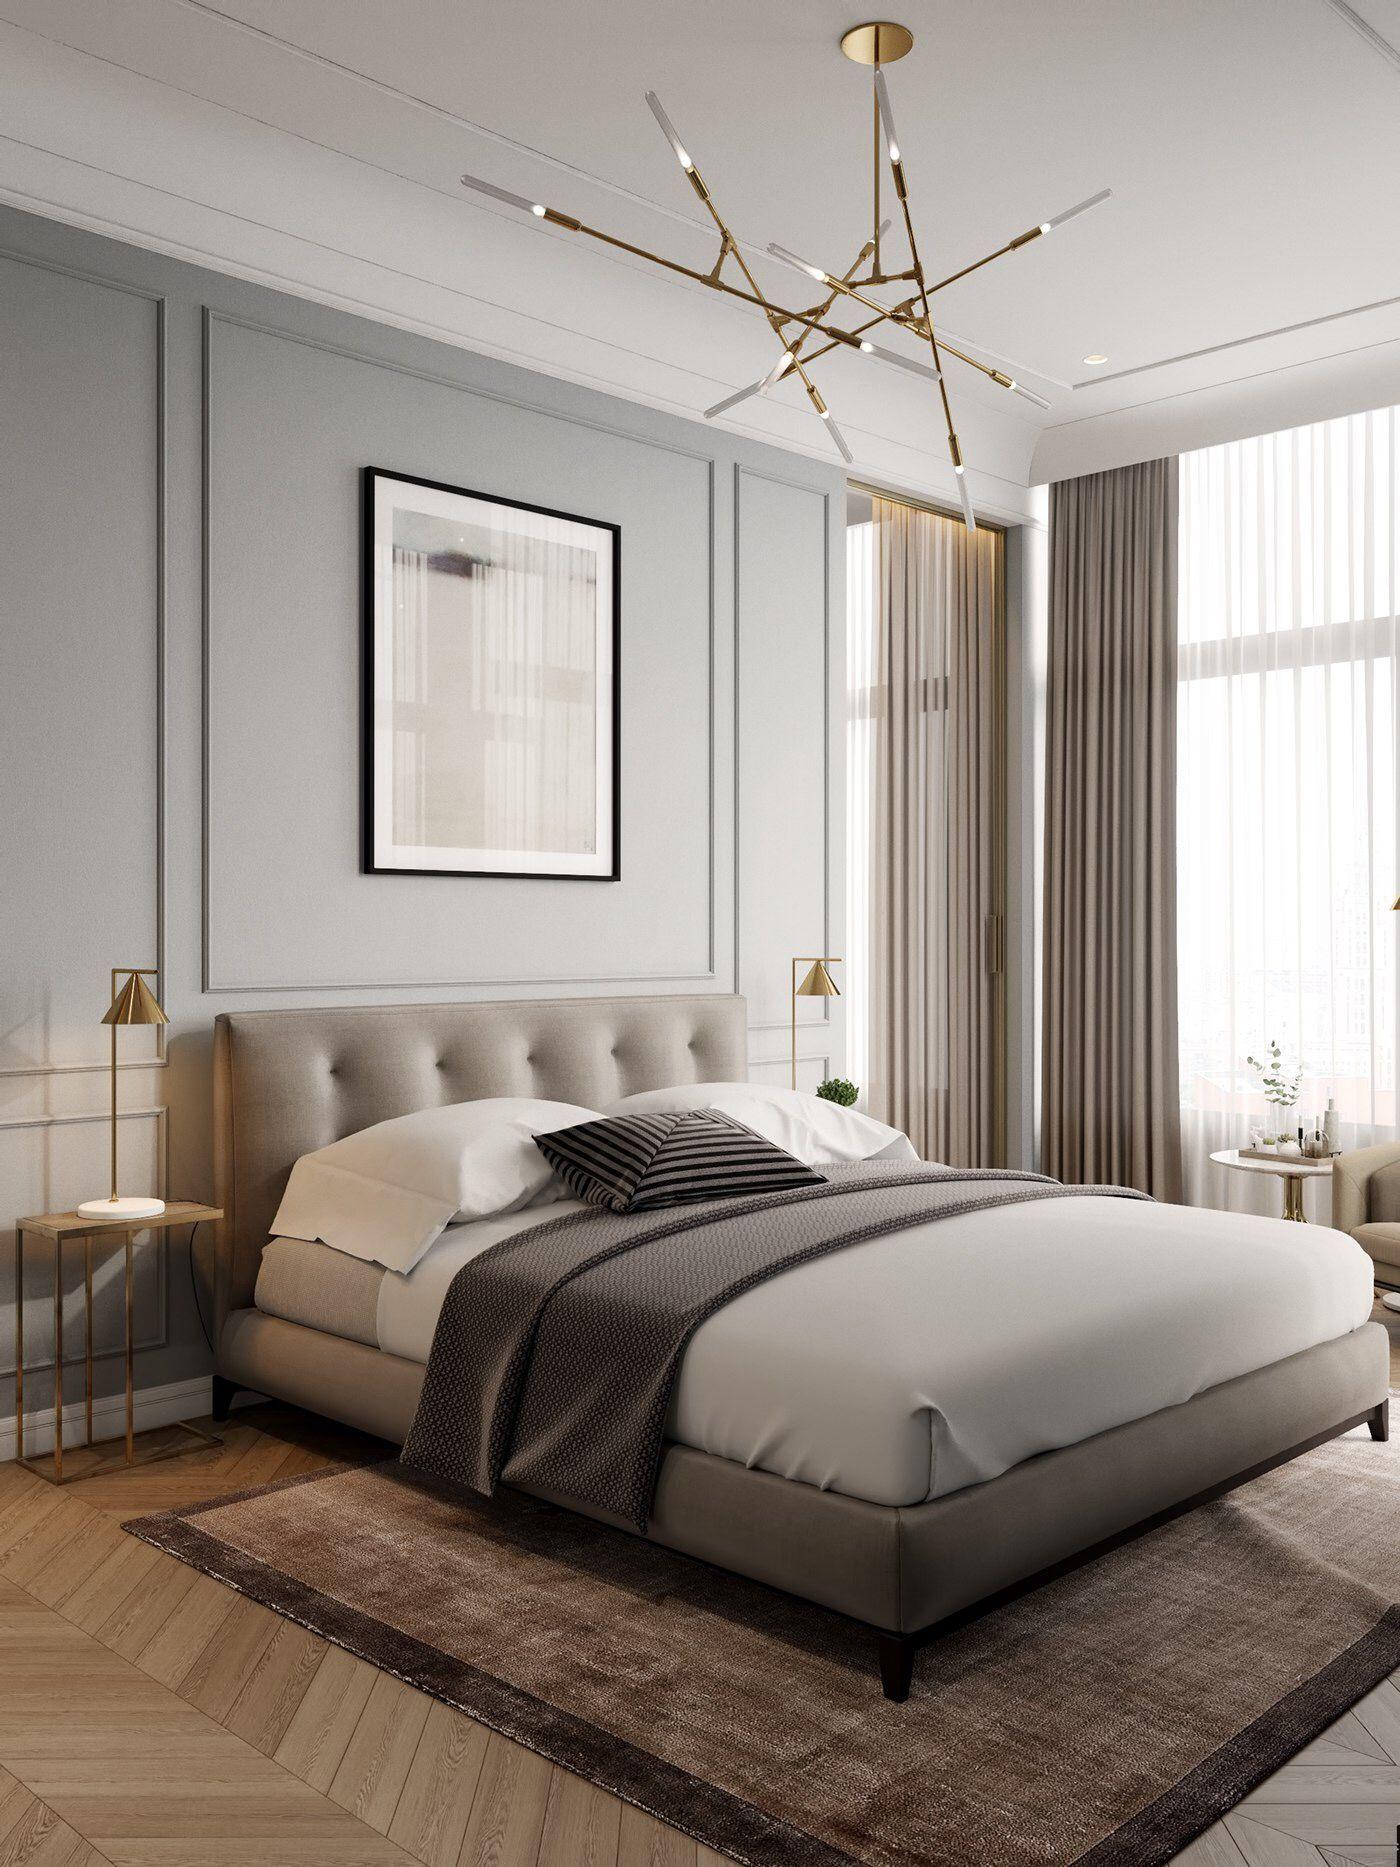 #Neutral #bedroom #inspo | Remodel bedroom, Bedroom ... on Neutral Minimalist Bedroom Ideas  id=68566